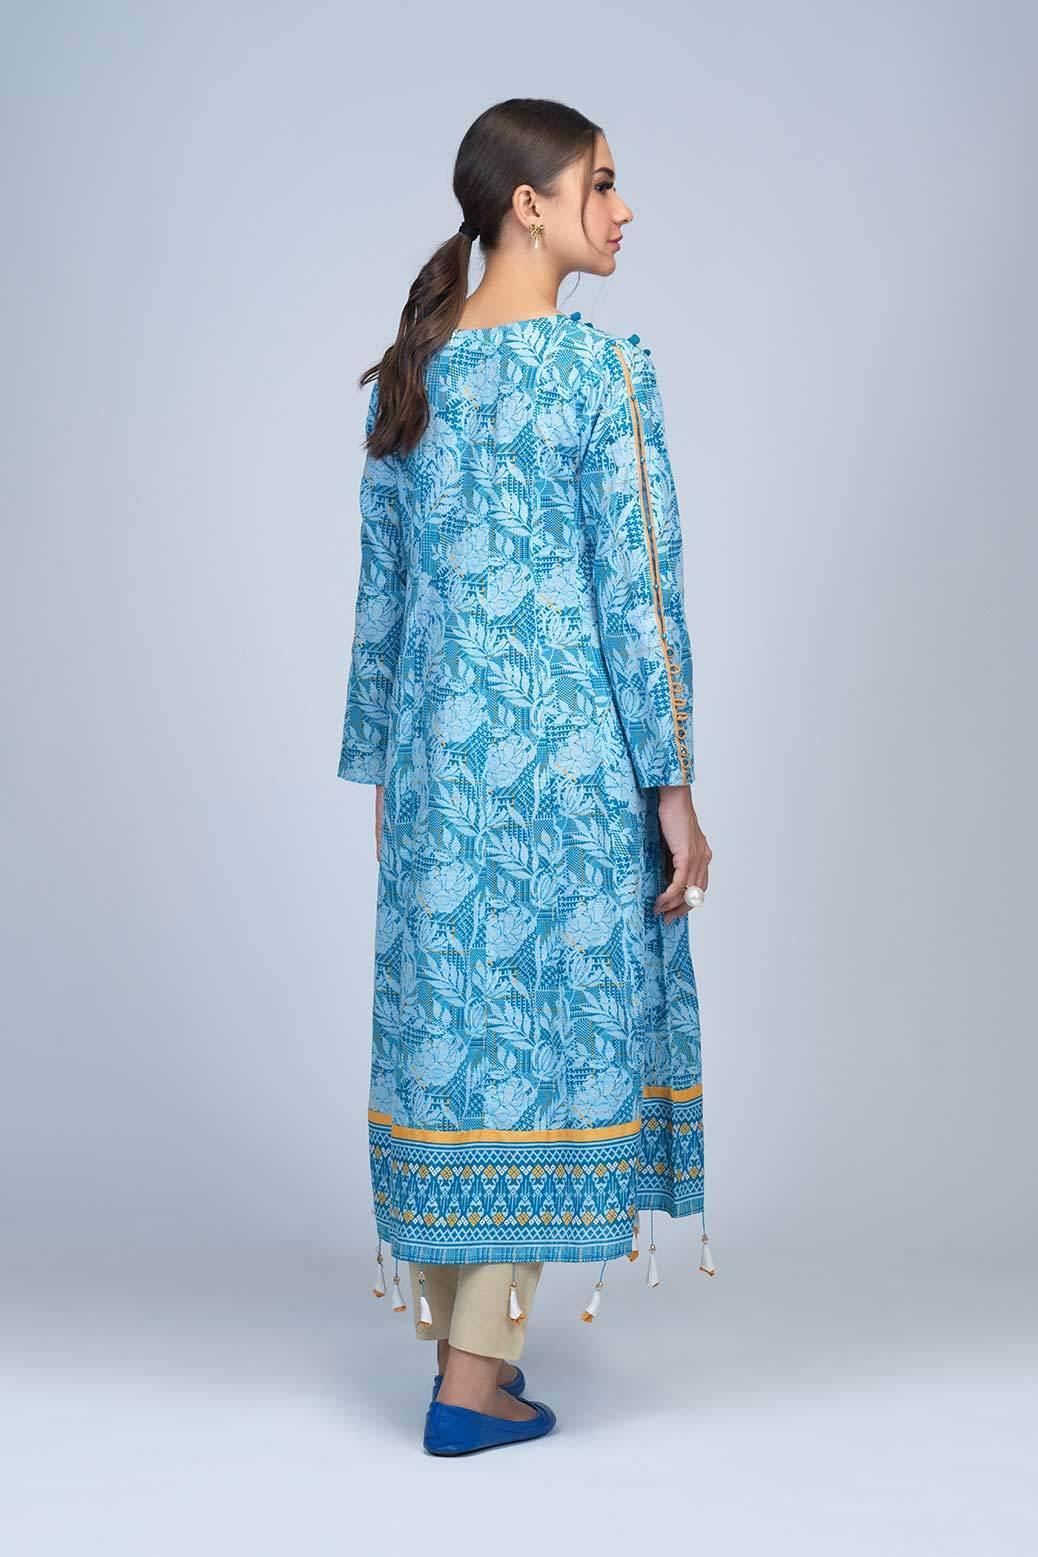 Bonanza Satrangi Winter Unstitched Dress Sky blue color back side view